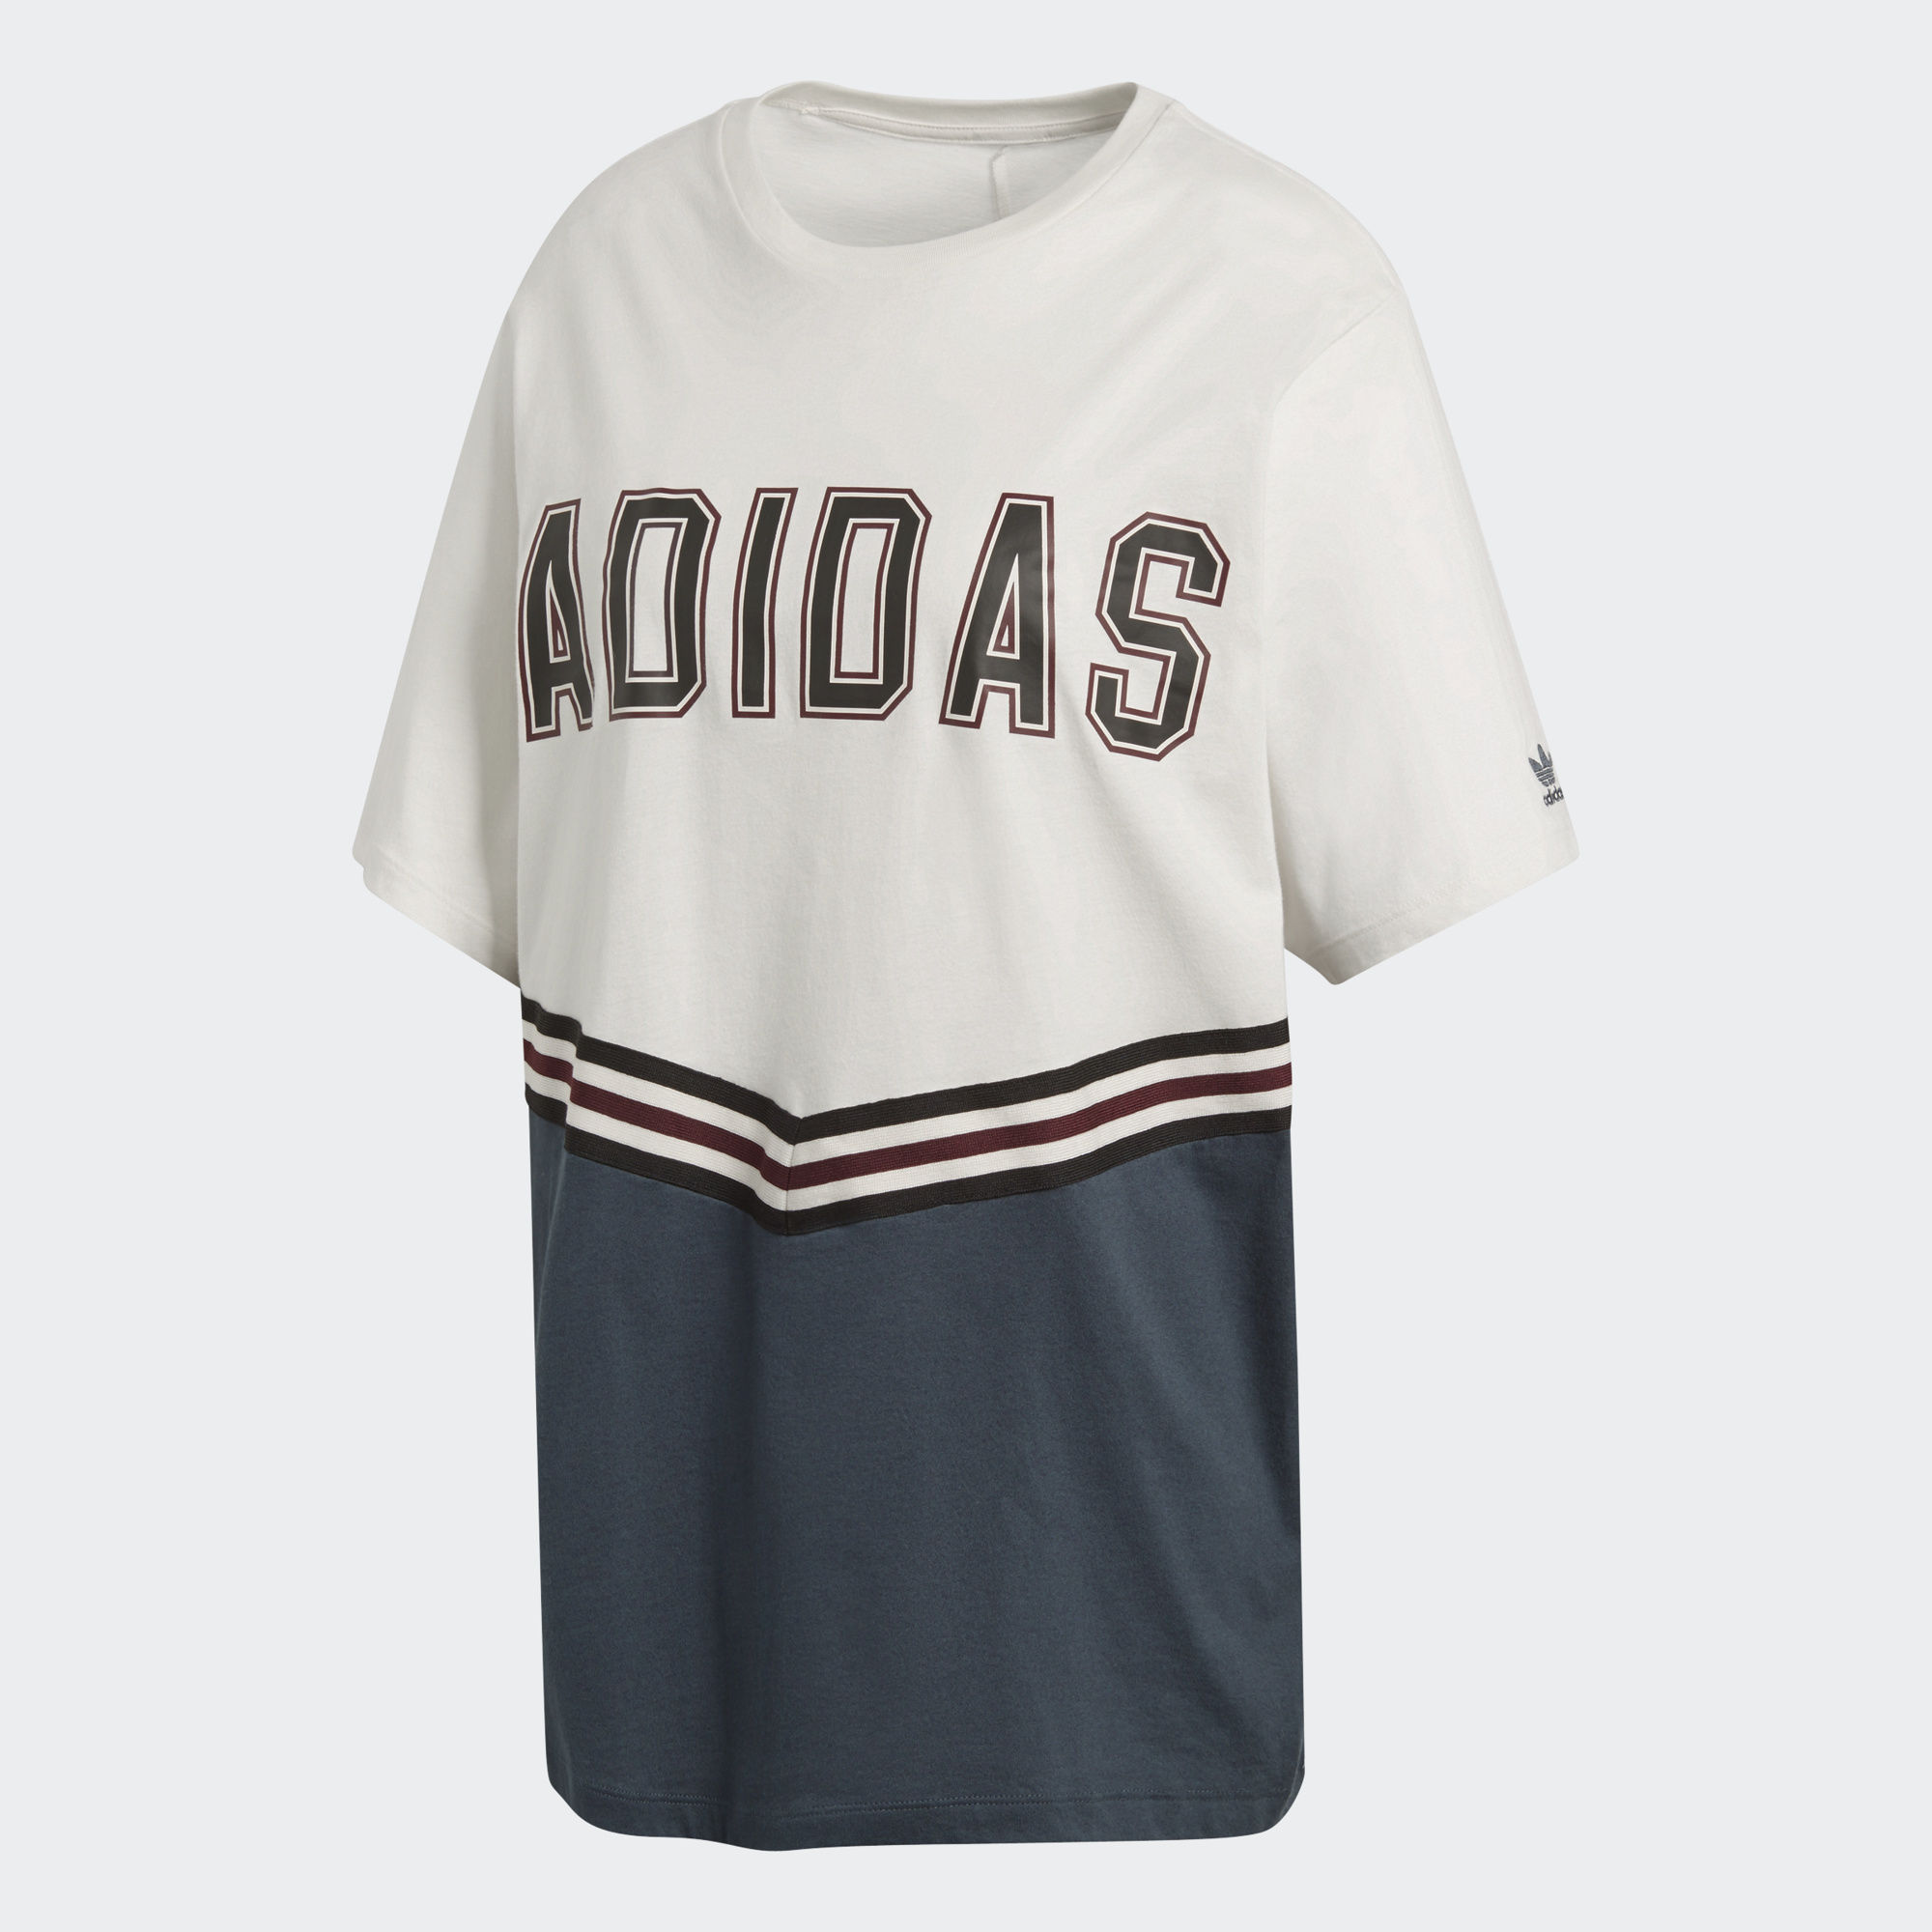 Футболка женская adidas Adibreak Ss Tee, цвет: белый, синий. CE1001. Размер 40 (46/48)